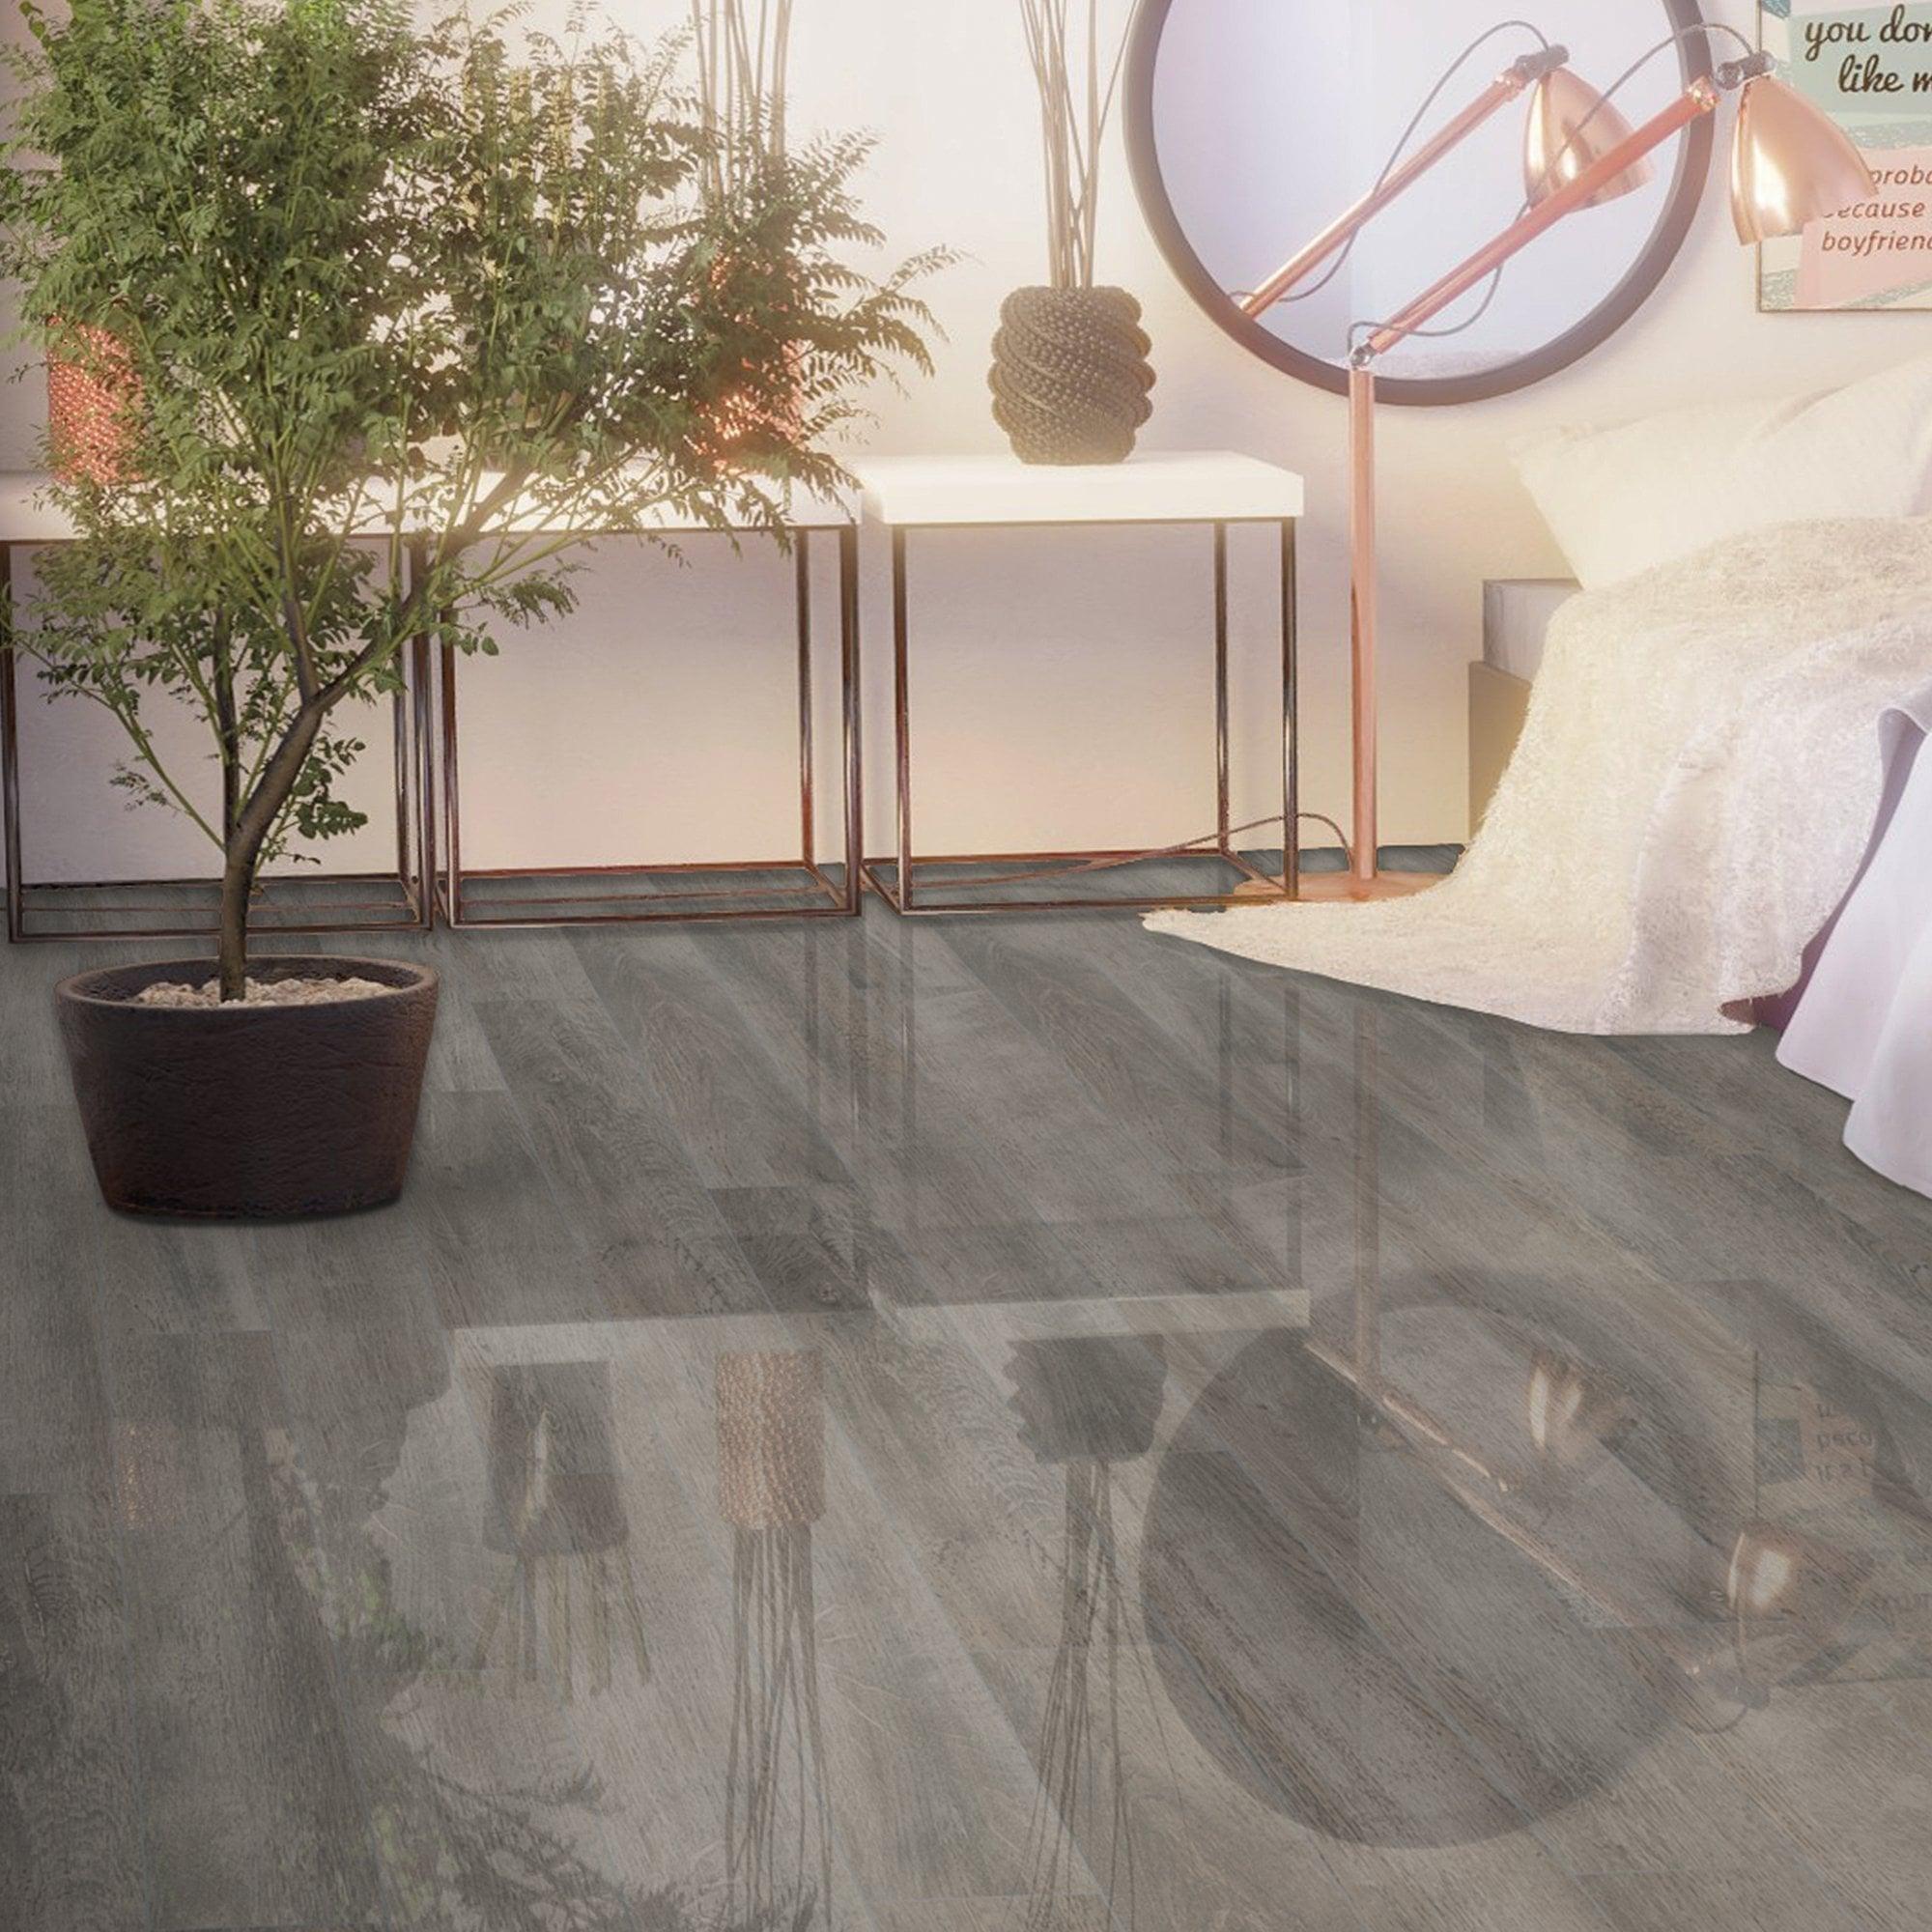 High Gloss Laminate Flooring D4187, Super Gloss White Laminate Flooring